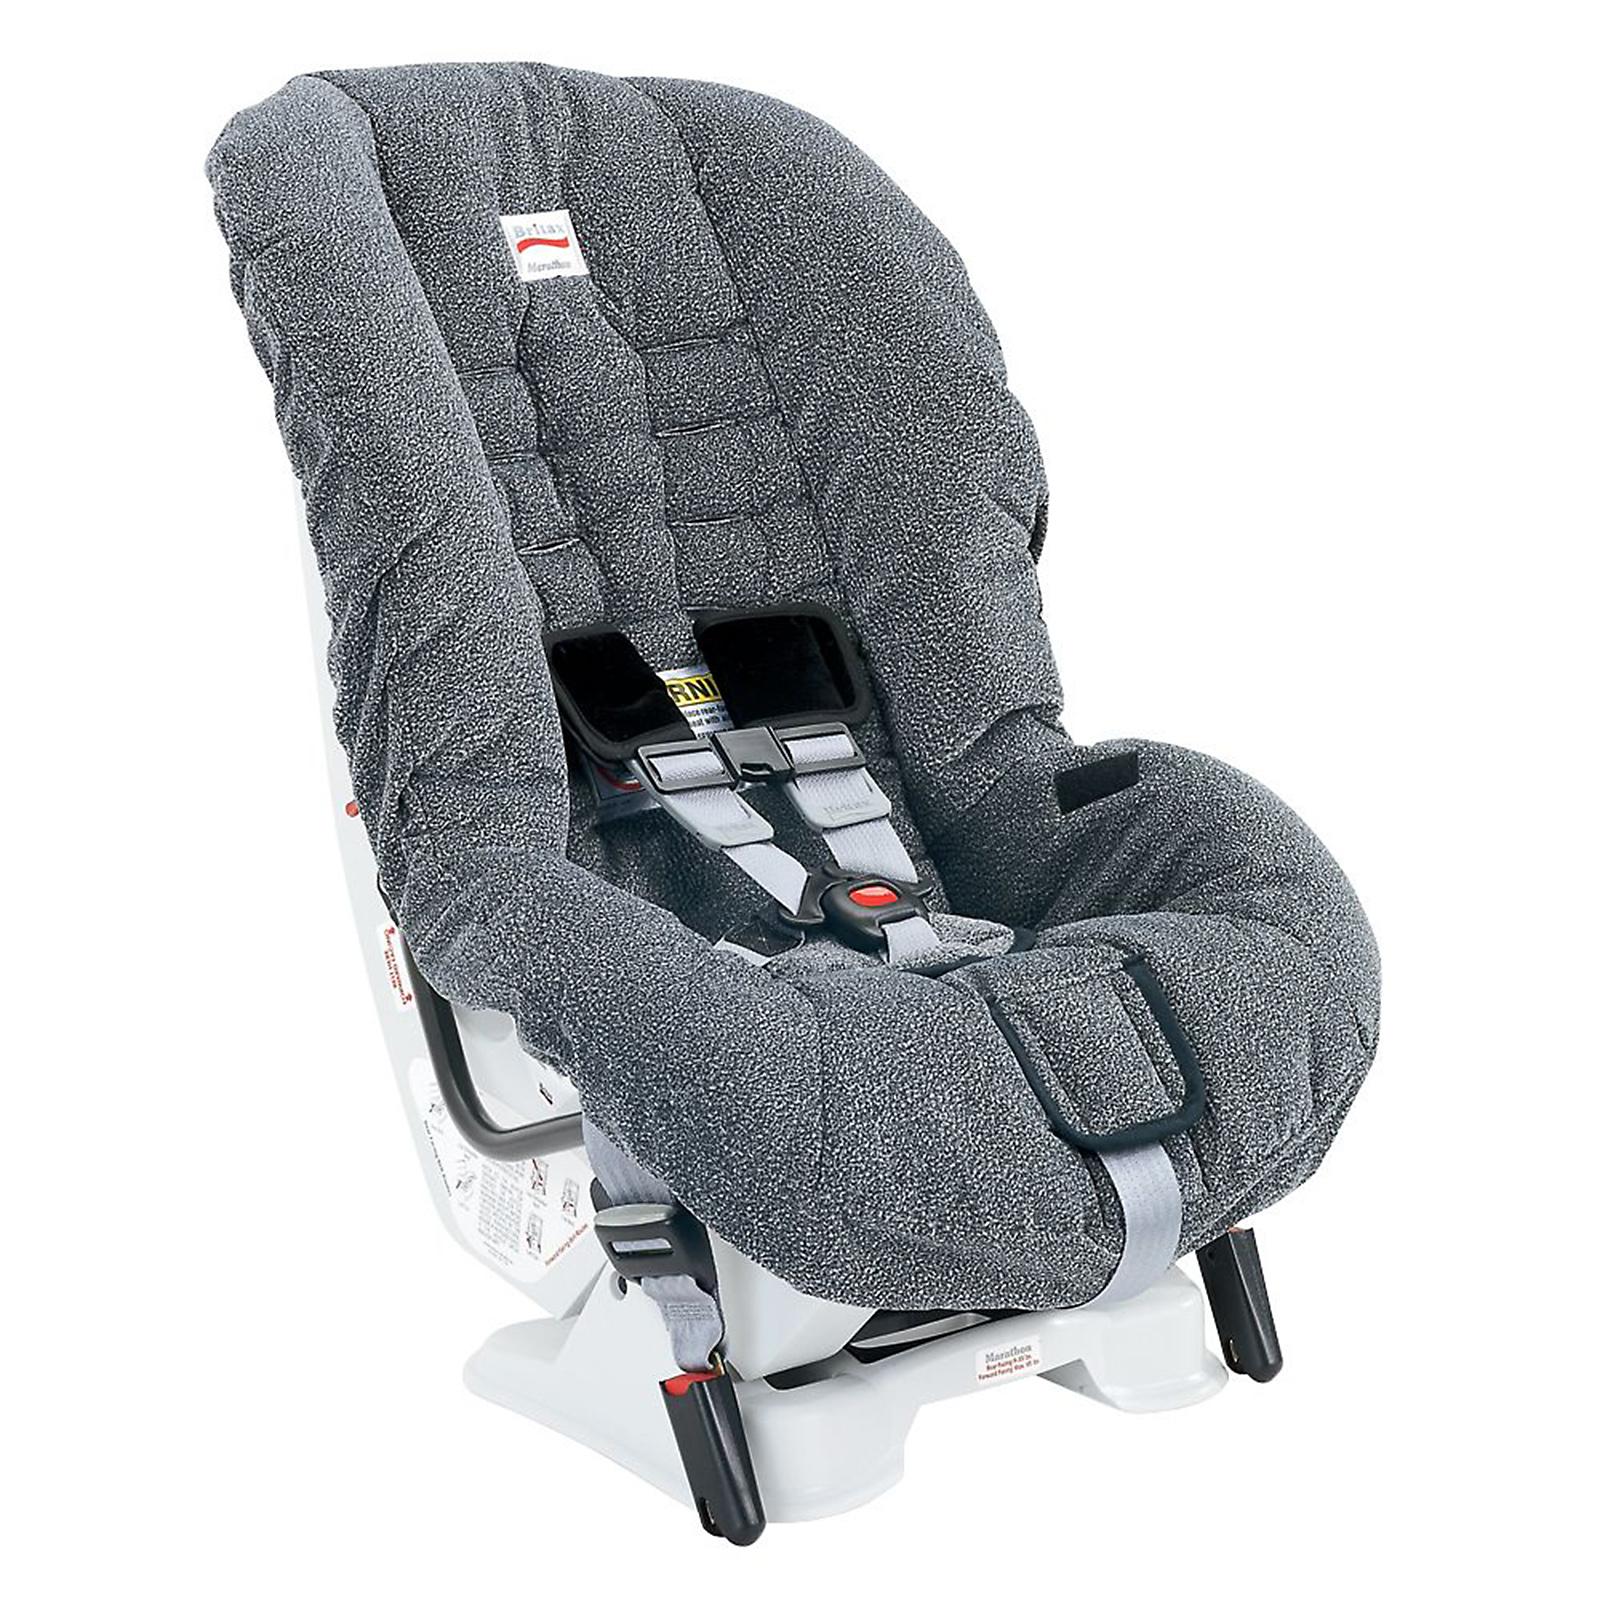 britax convertible baby car seat marathon granite baby baby gear car seats. Black Bedroom Furniture Sets. Home Design Ideas